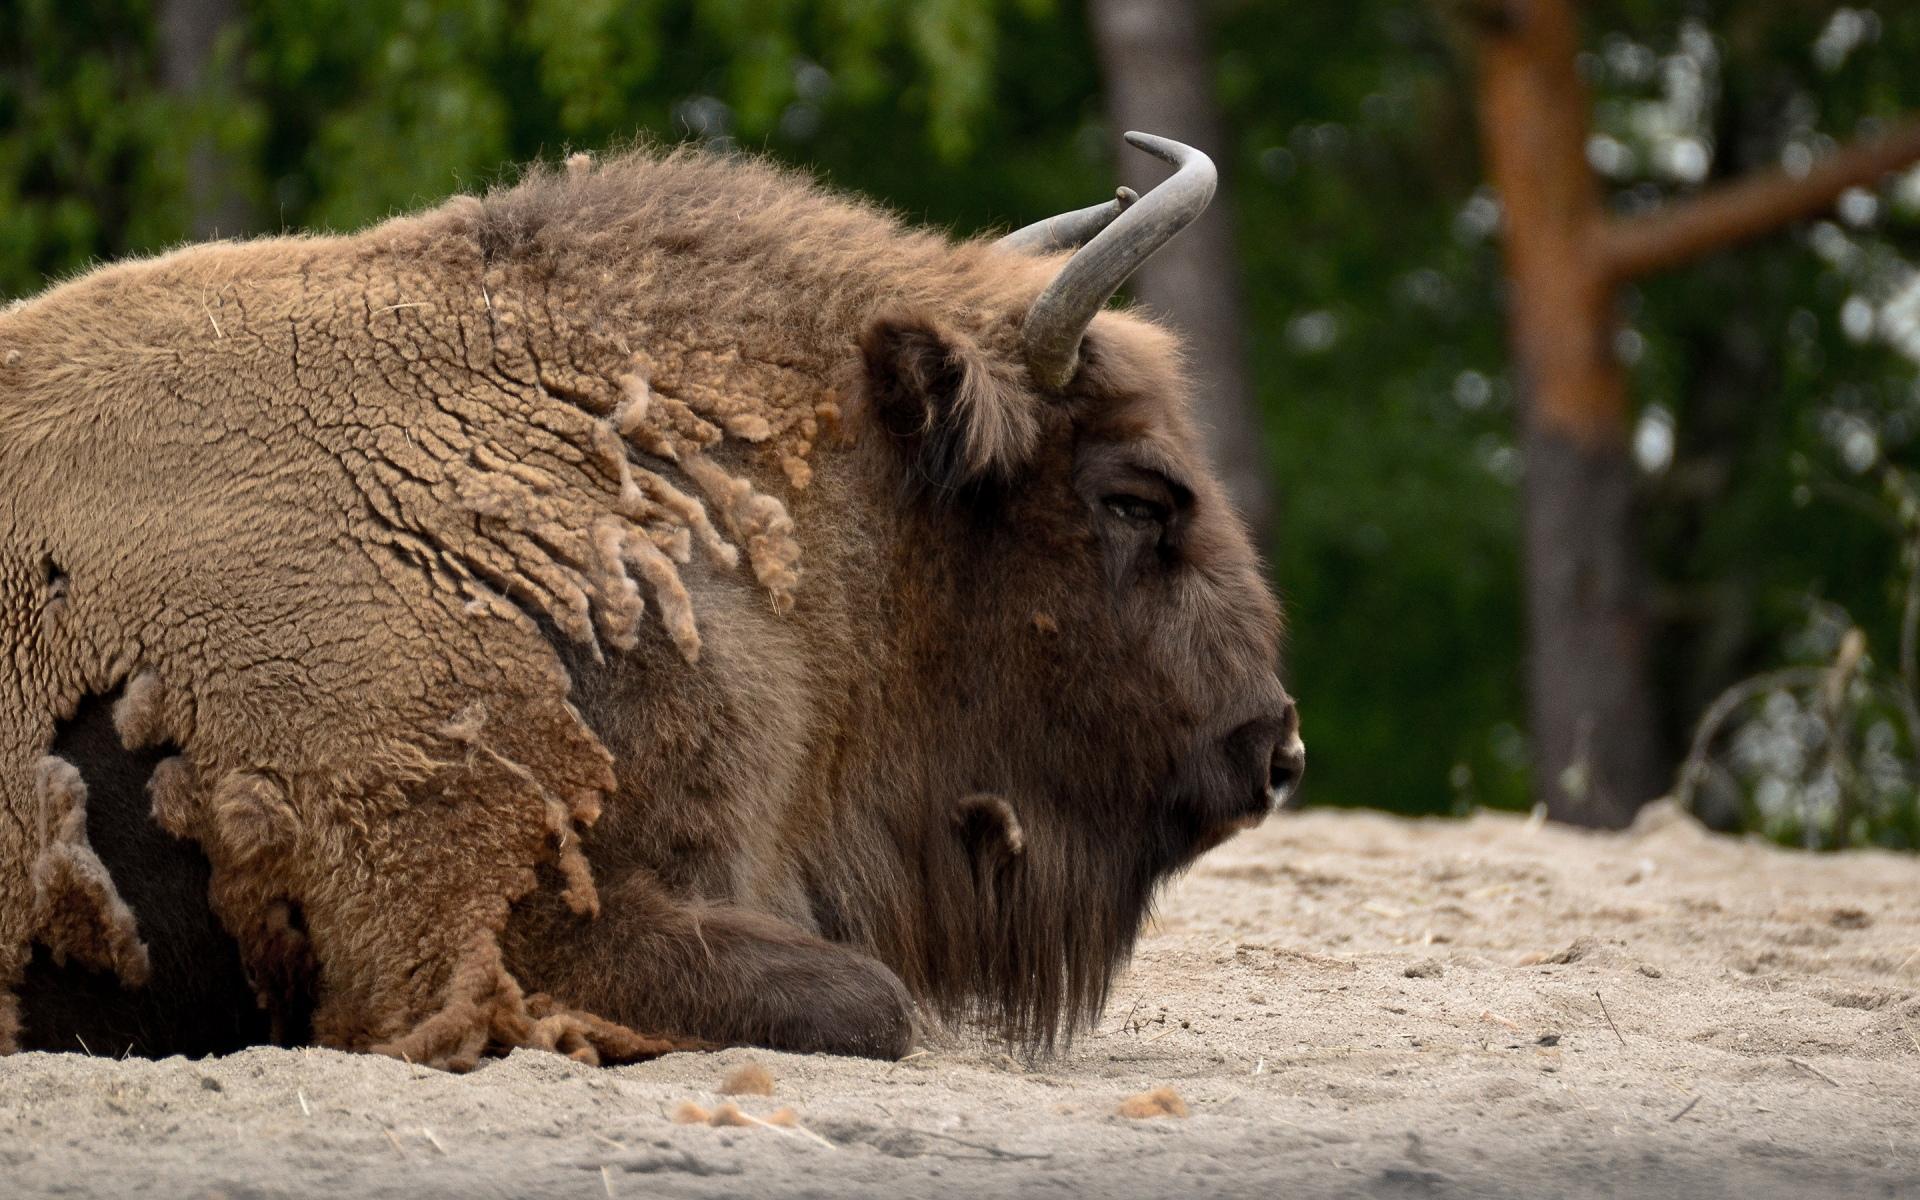 American Bison Wallpaper HD Download